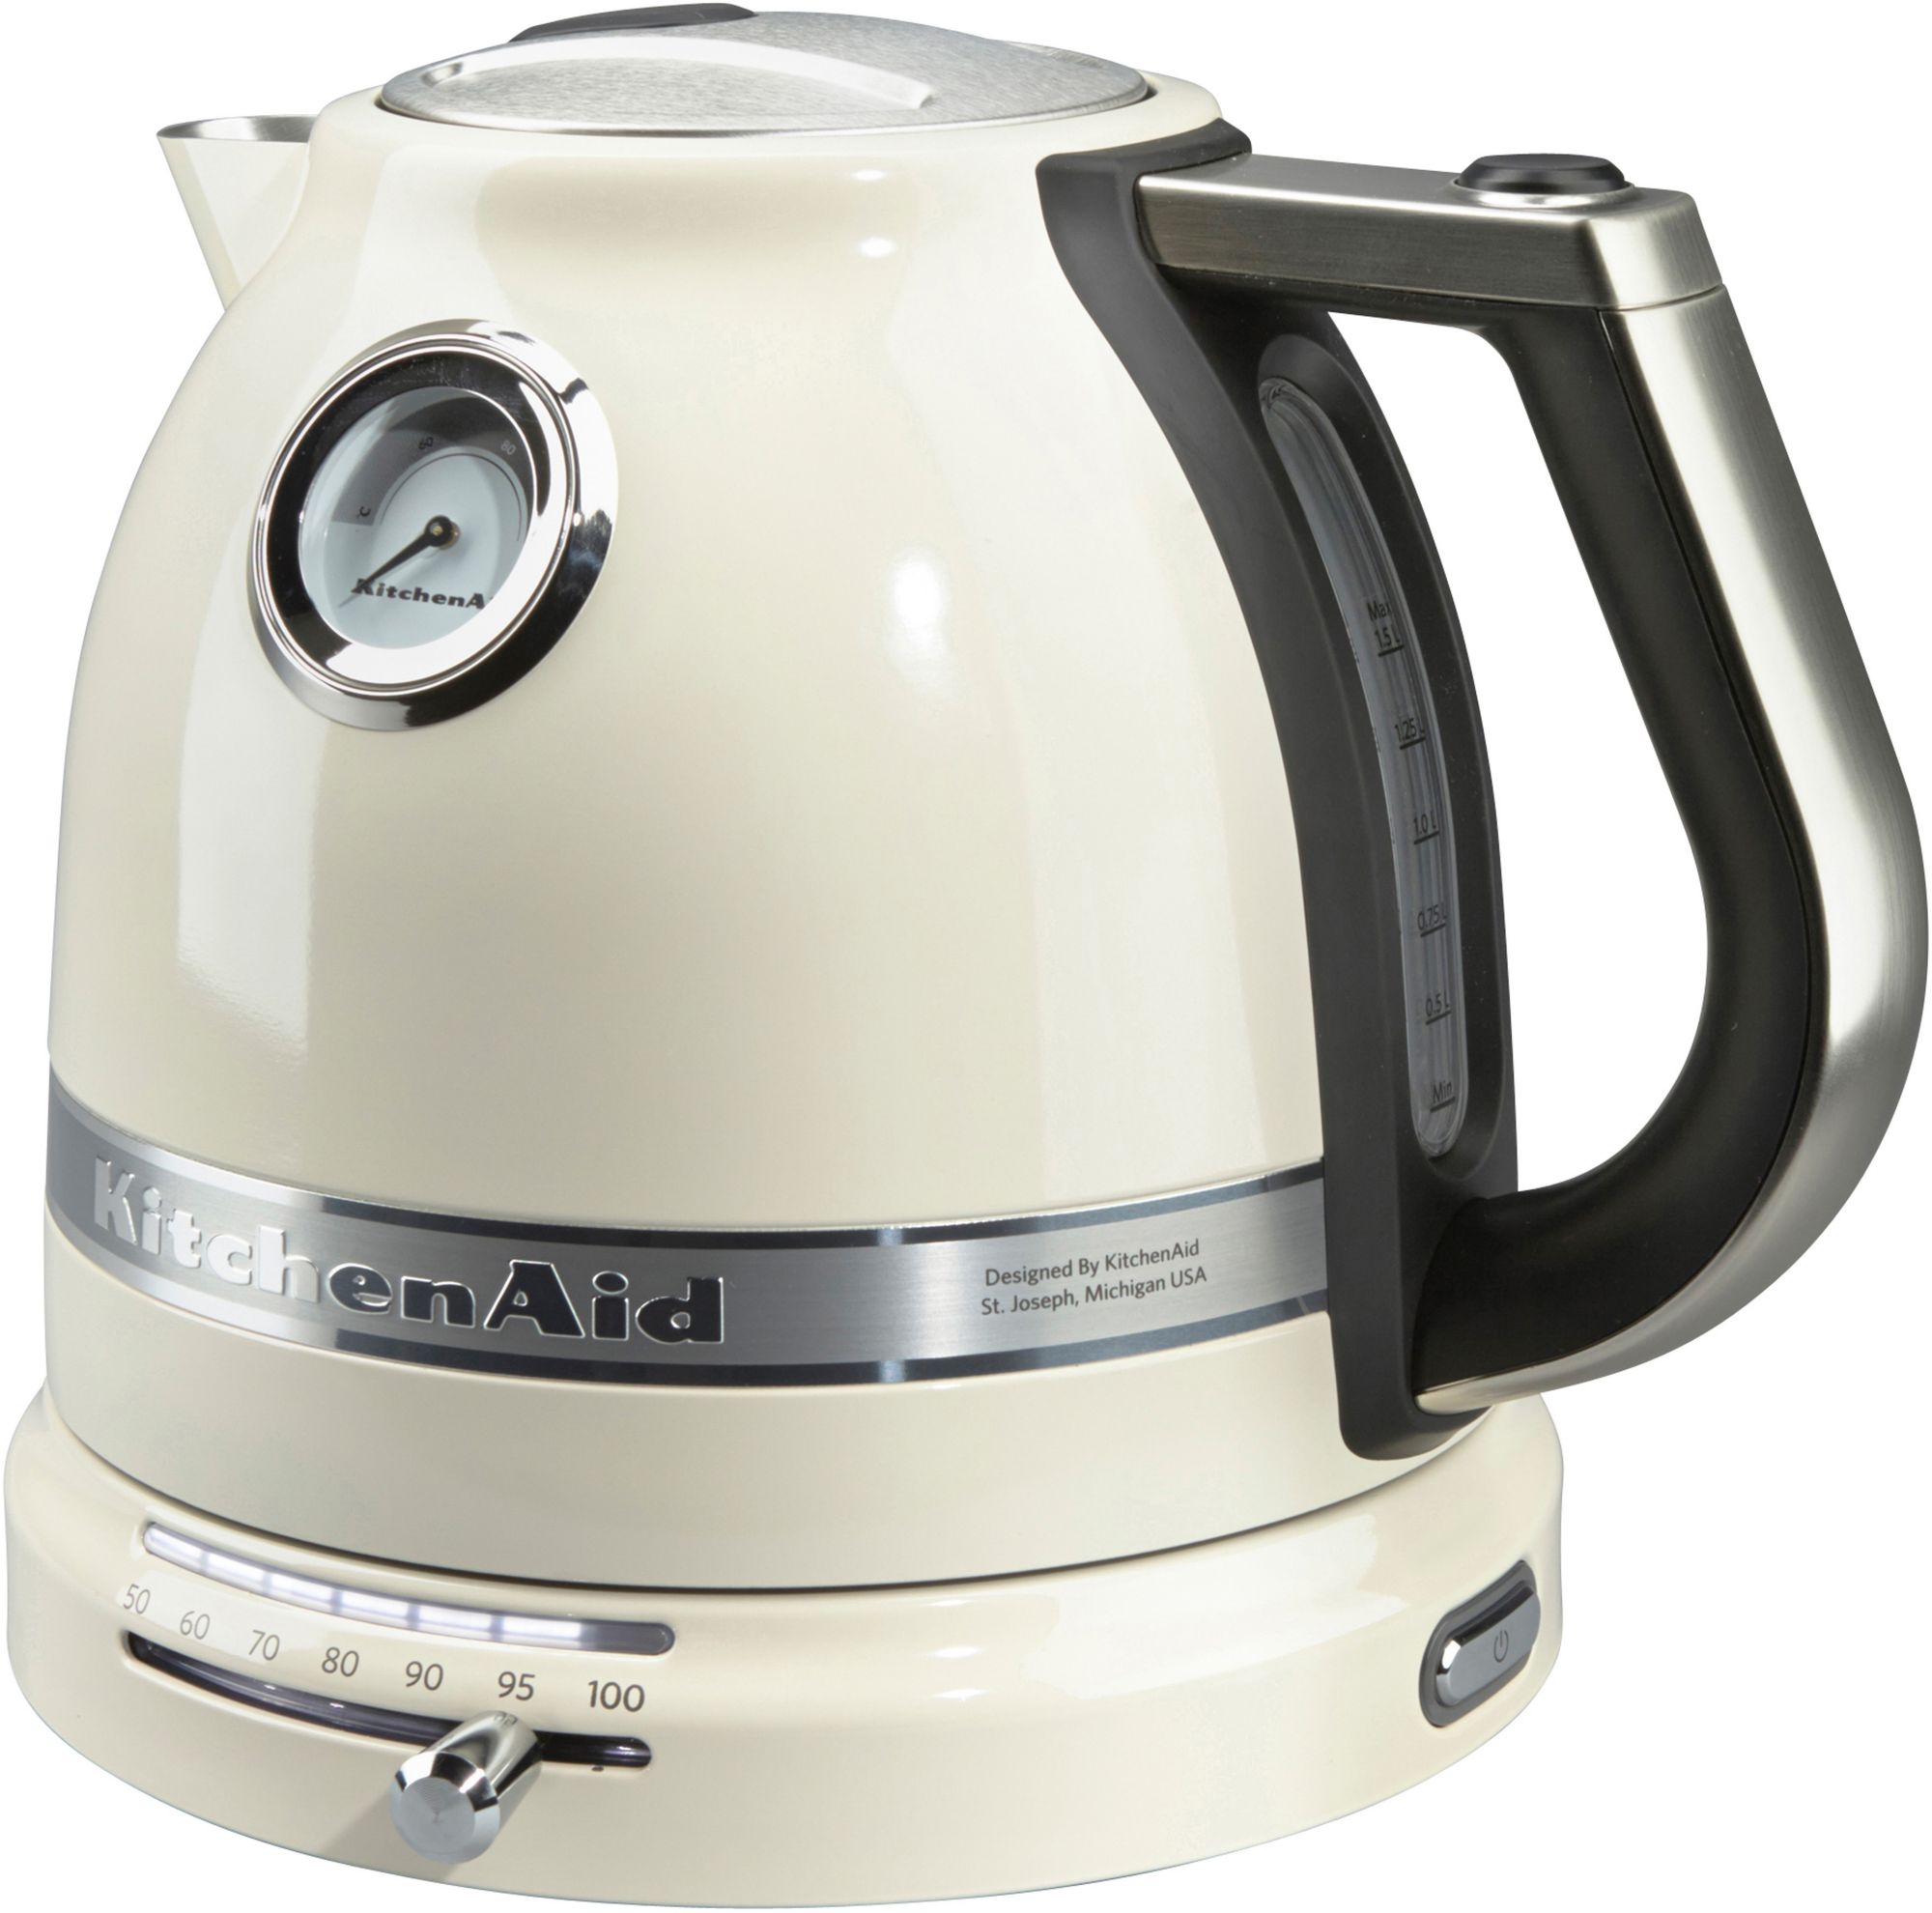 Kitchenaid Wasserkocher Artisan 5kek1522eac 1 5 Liter